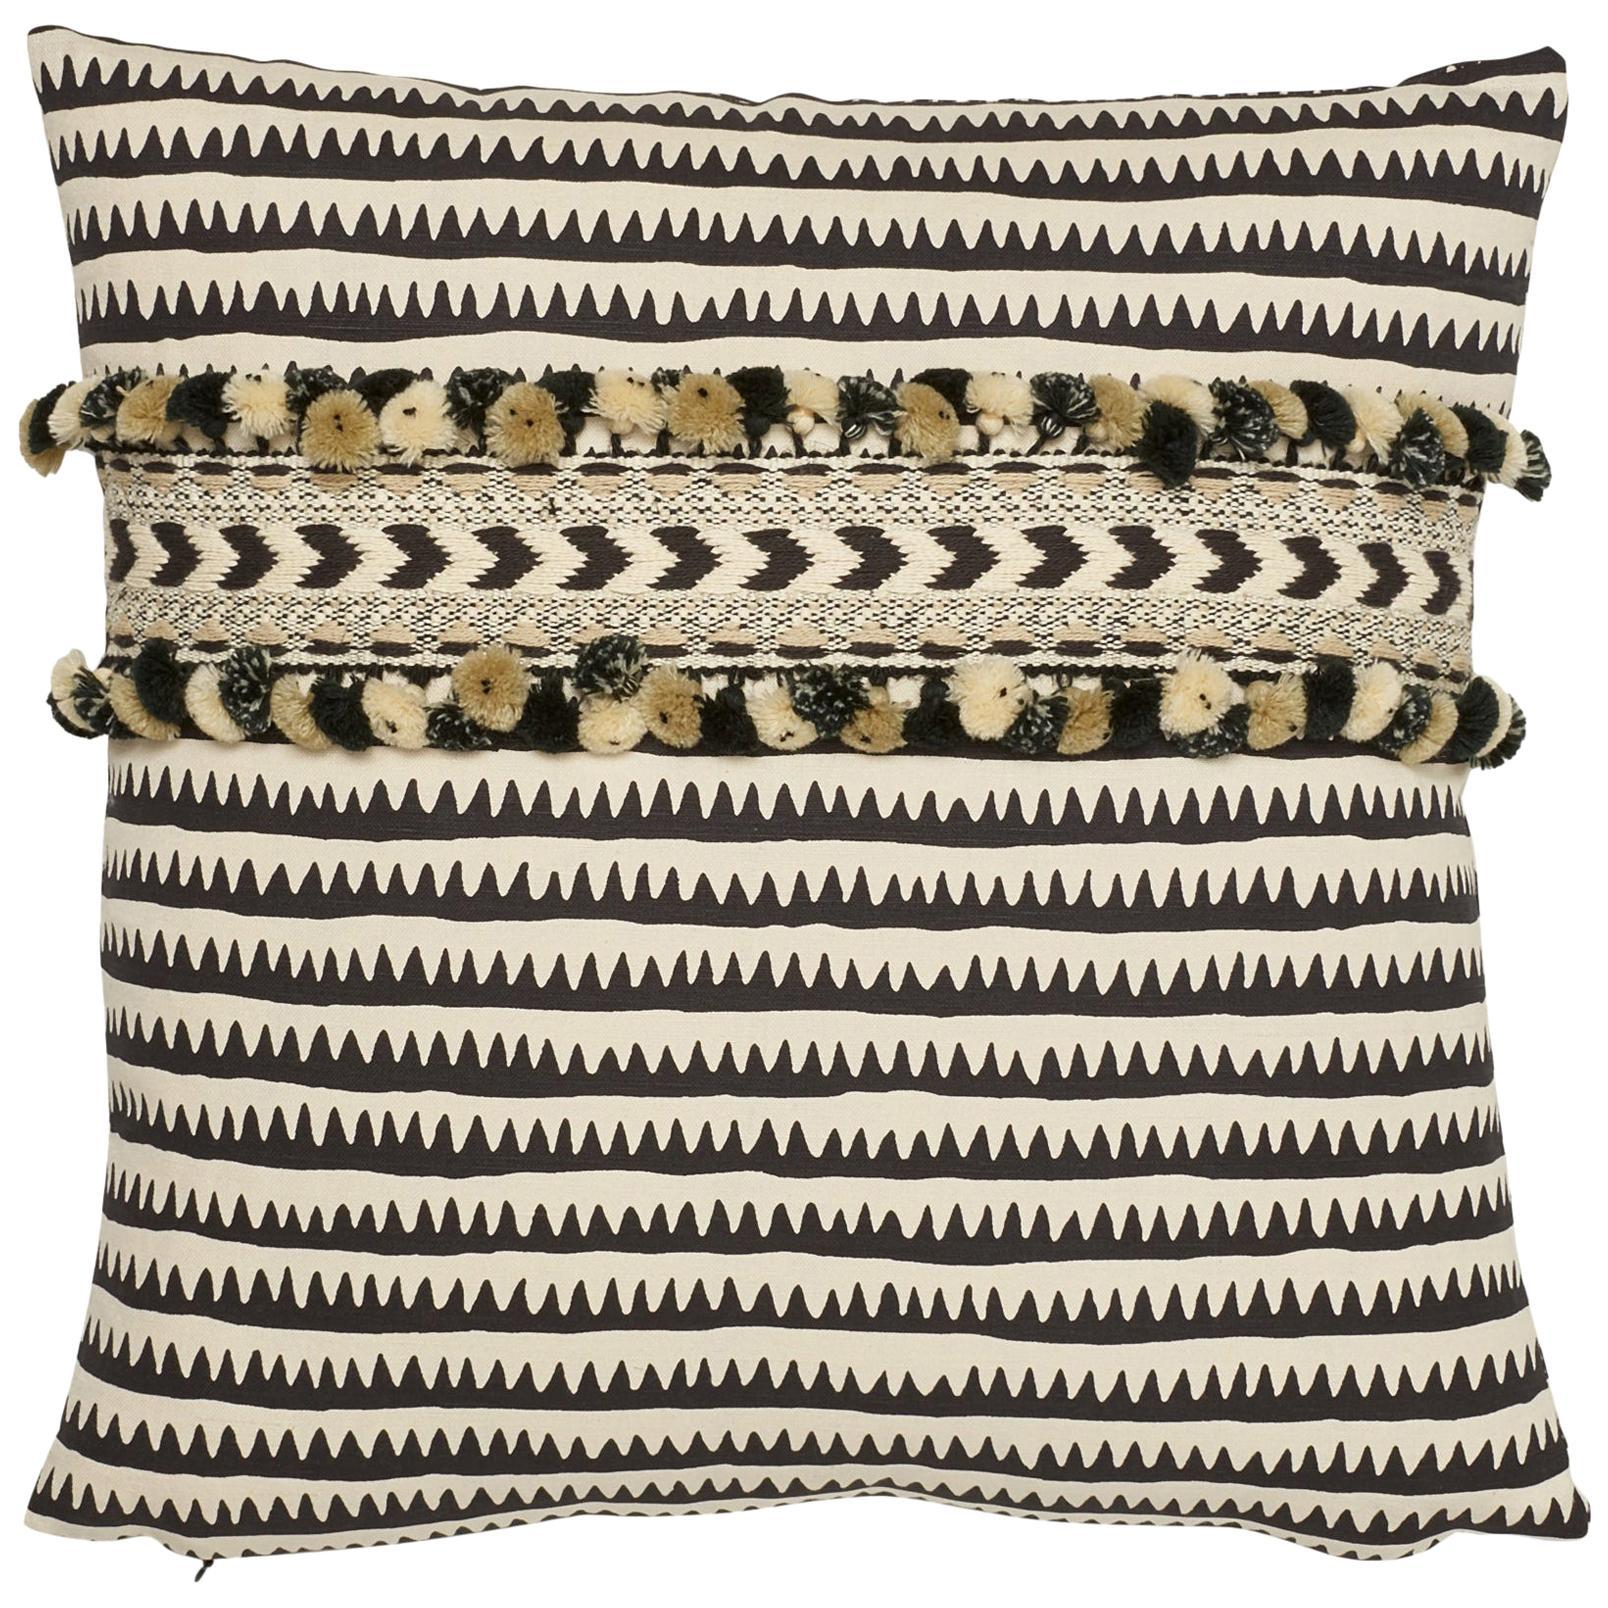 Schumacher Corfu Stripe Black Linen Cotton Two-Sided Pillow, Maracana Pom Tape